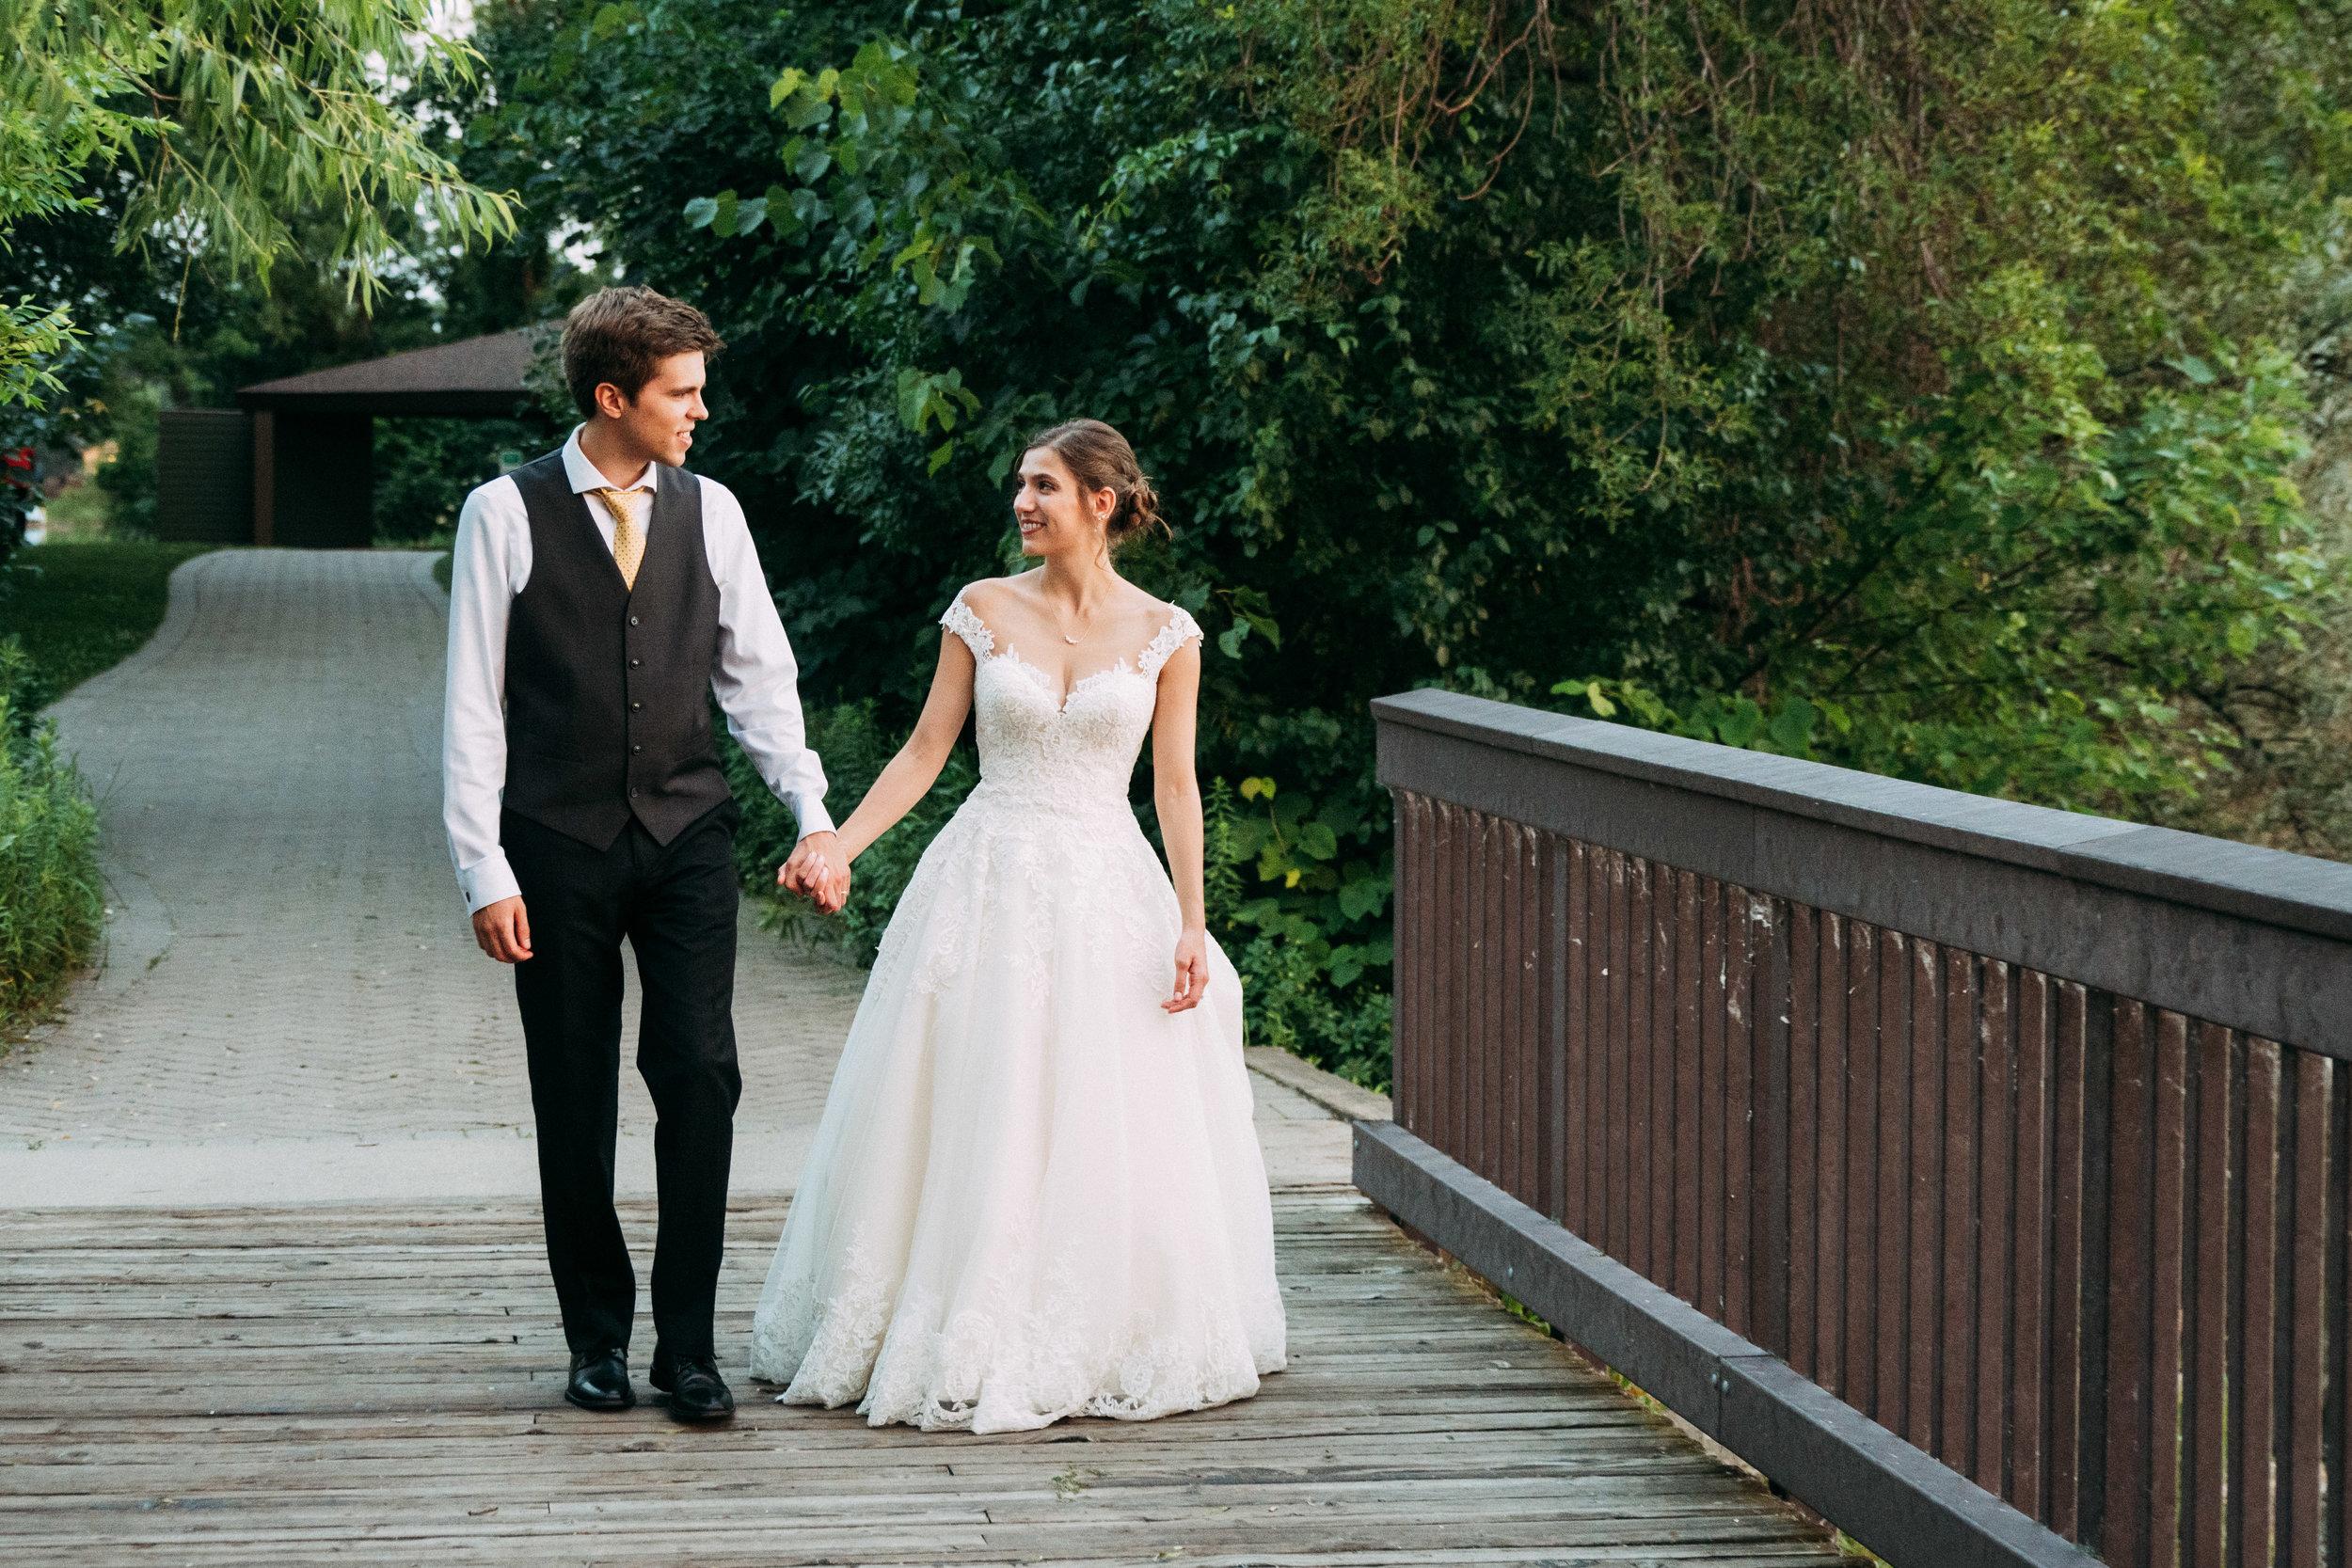 52-Liza_Chris_Minneapolis_Minnesota_Wedding.jpg